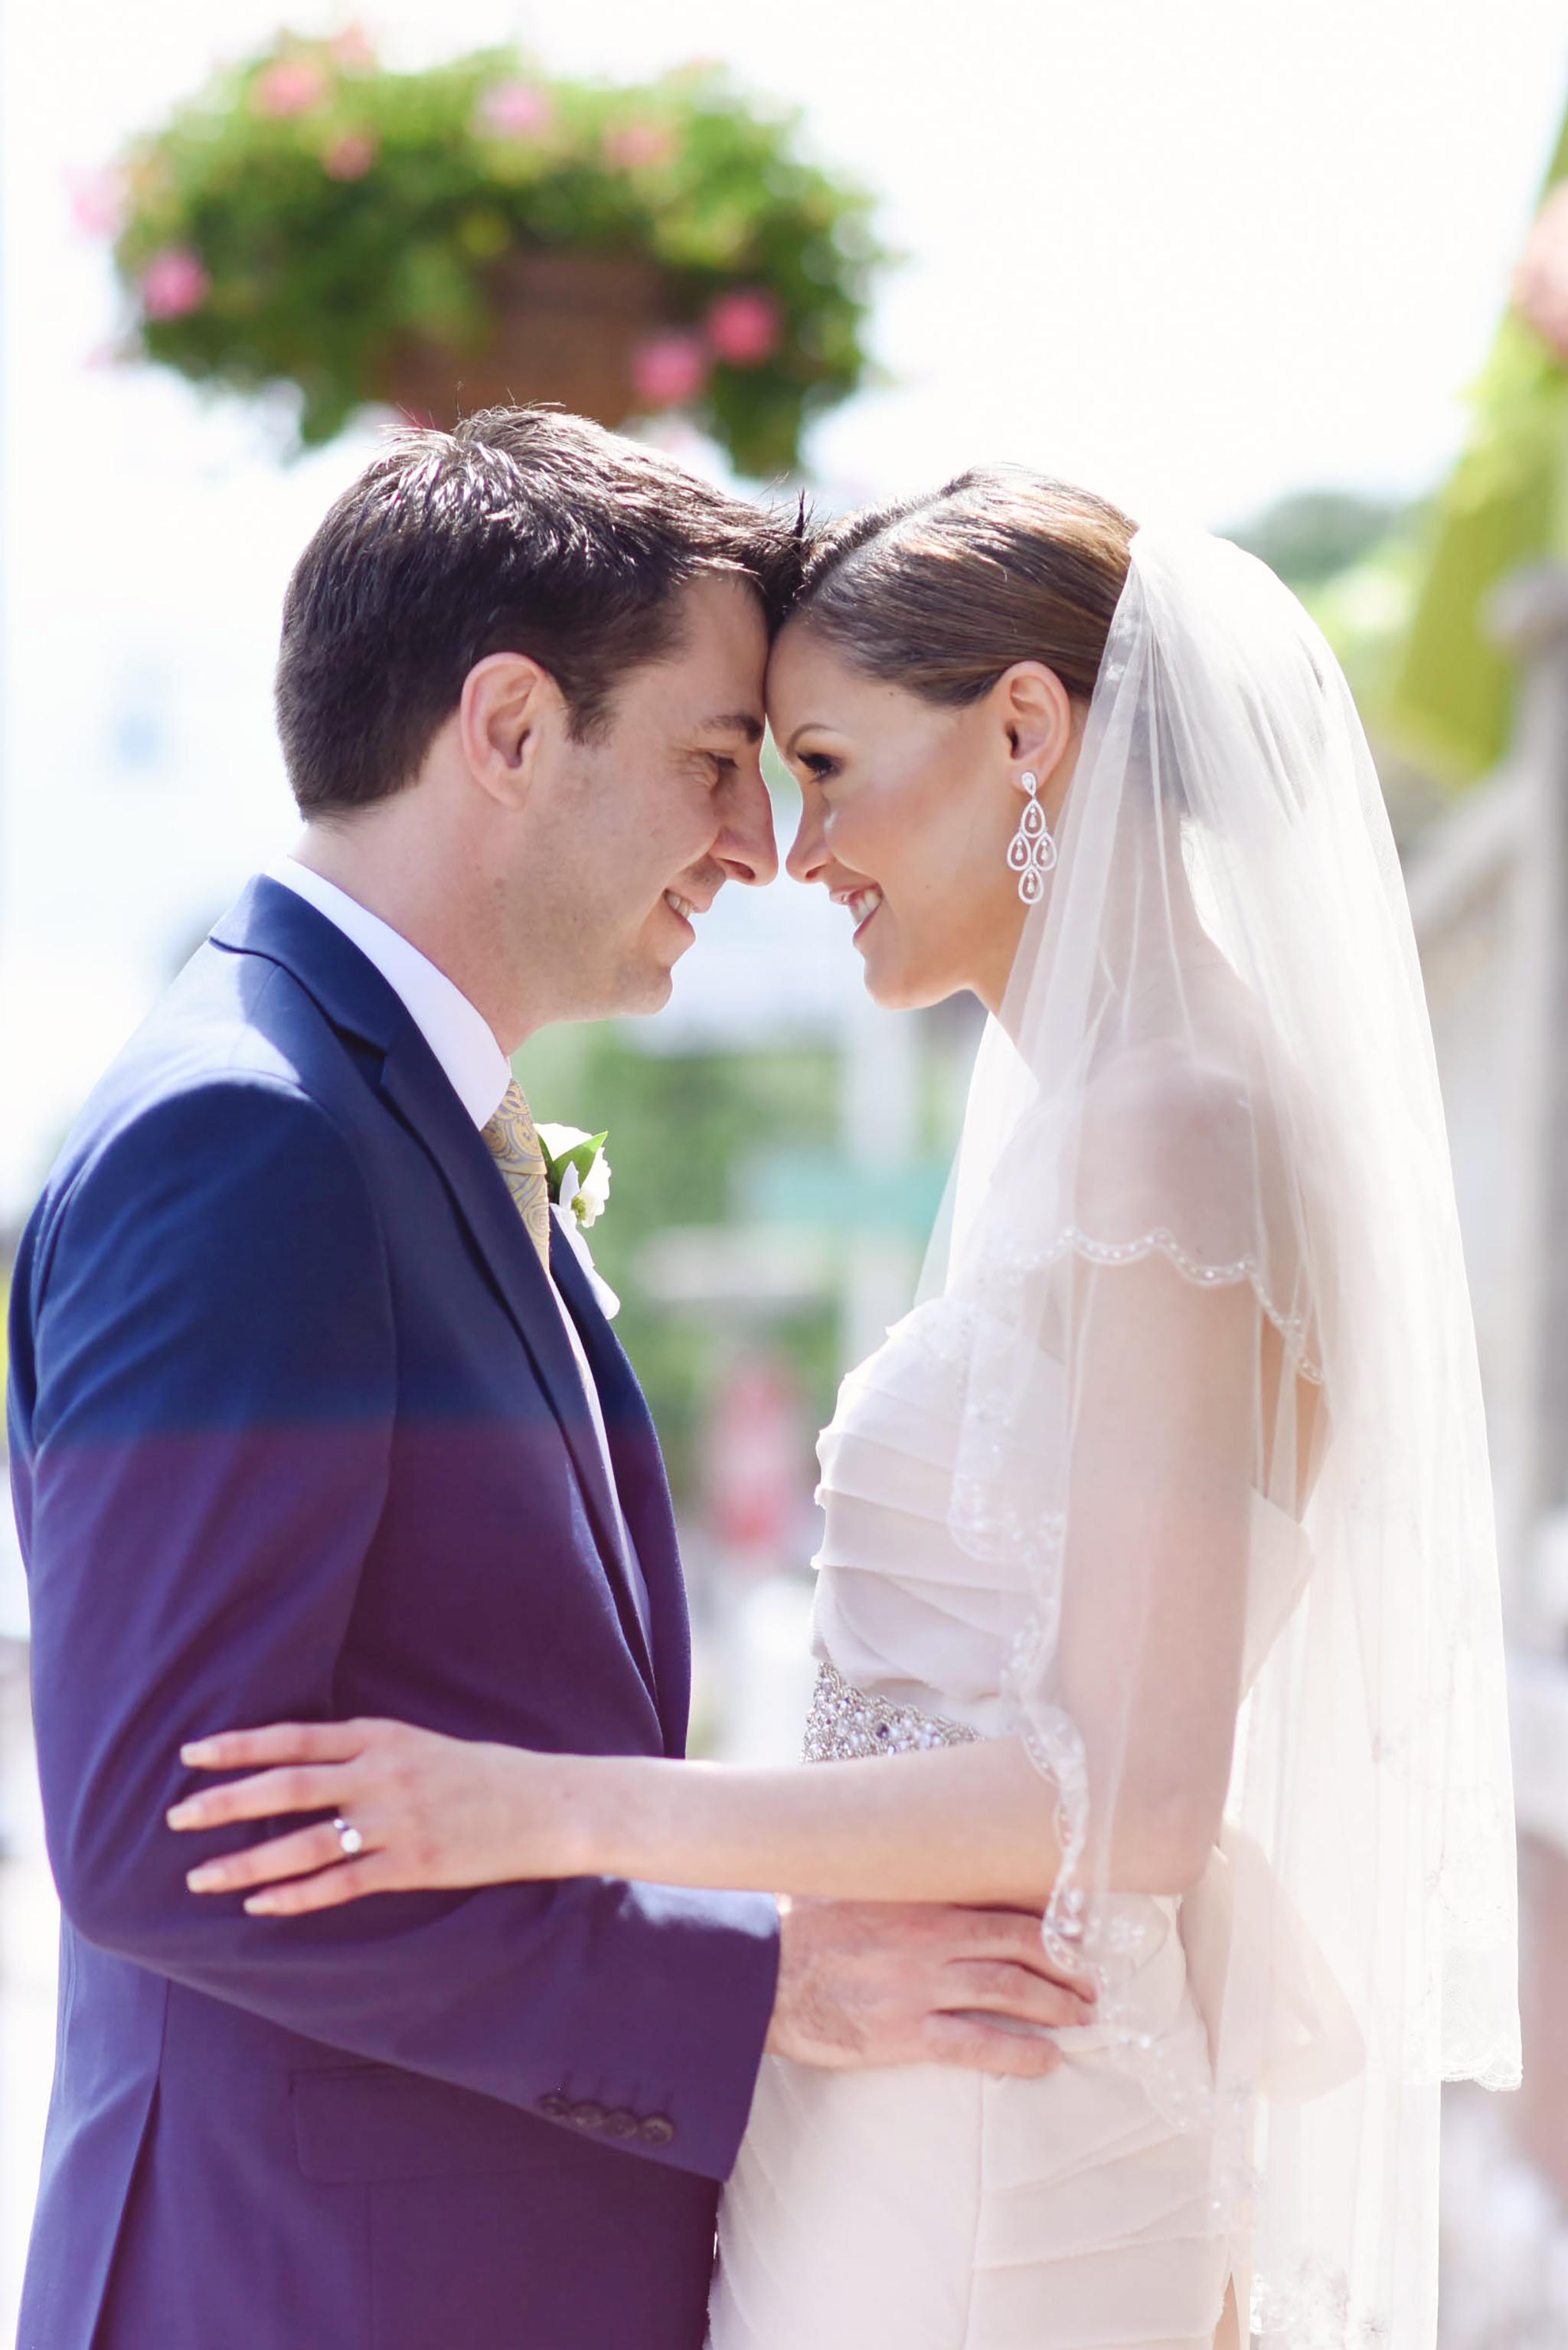 NJ-NY-wedding-photographer-008NJ-NY-wedding-photographer-008NJ-NY-WEDDING-PHOTOGRAPHER-008.JPG